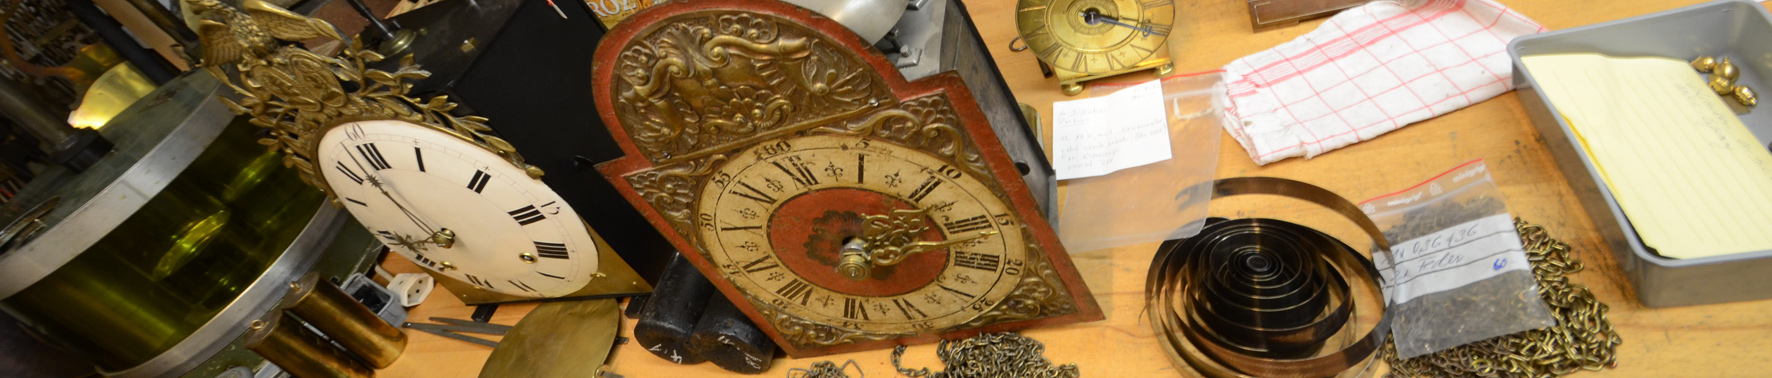 Uhren Arbeitsmaterial